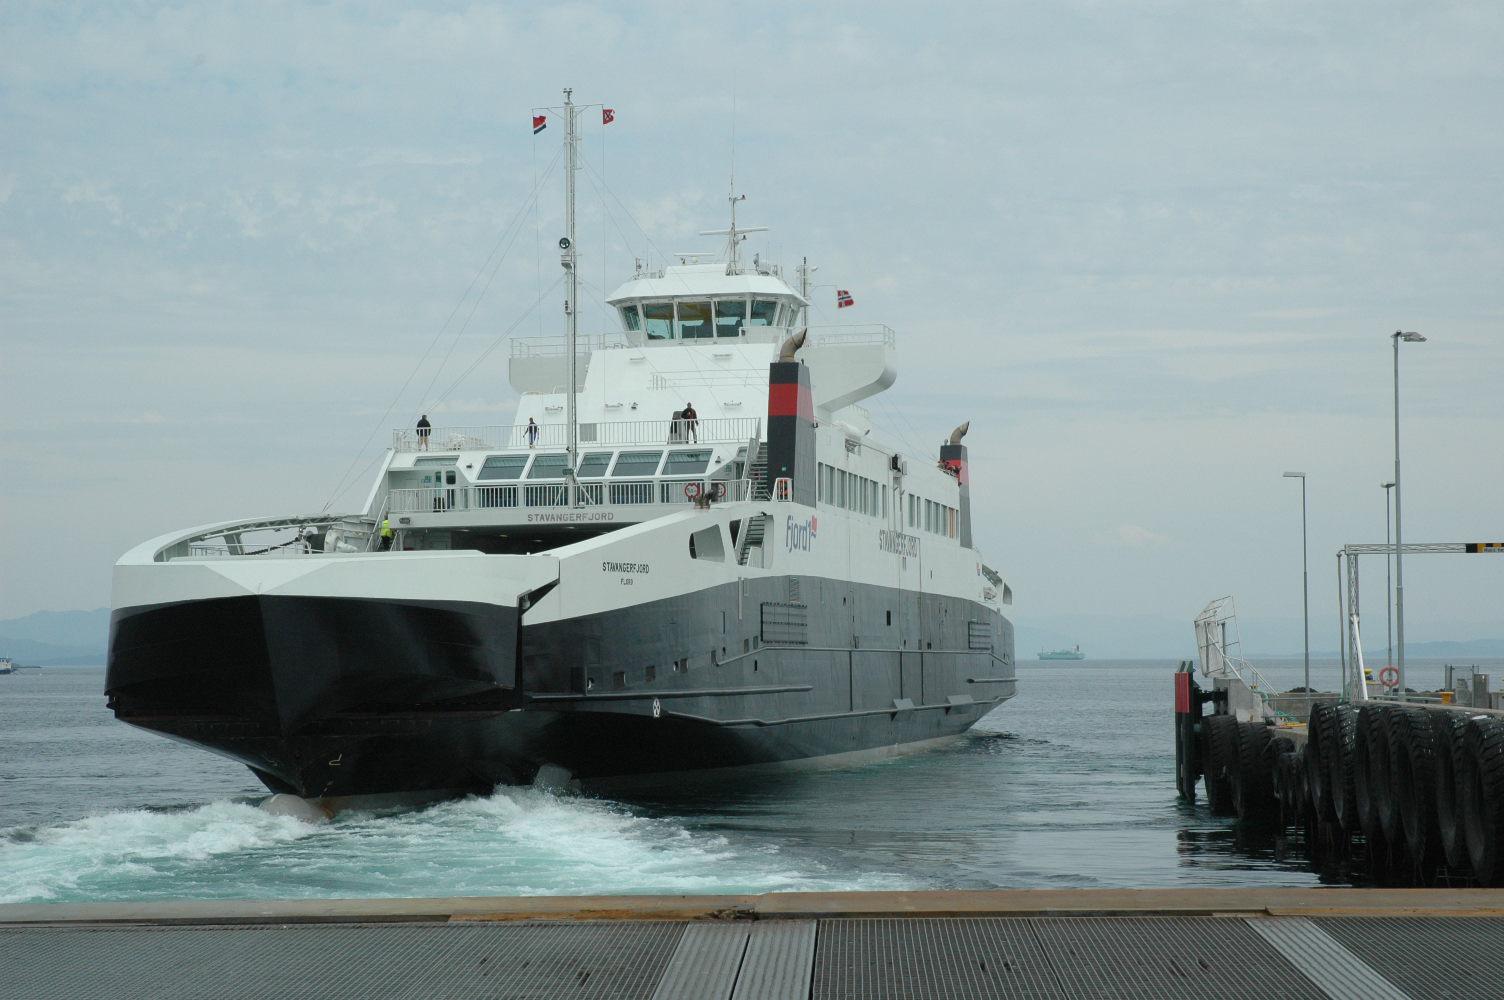 Transport in Norway - Wikipedia